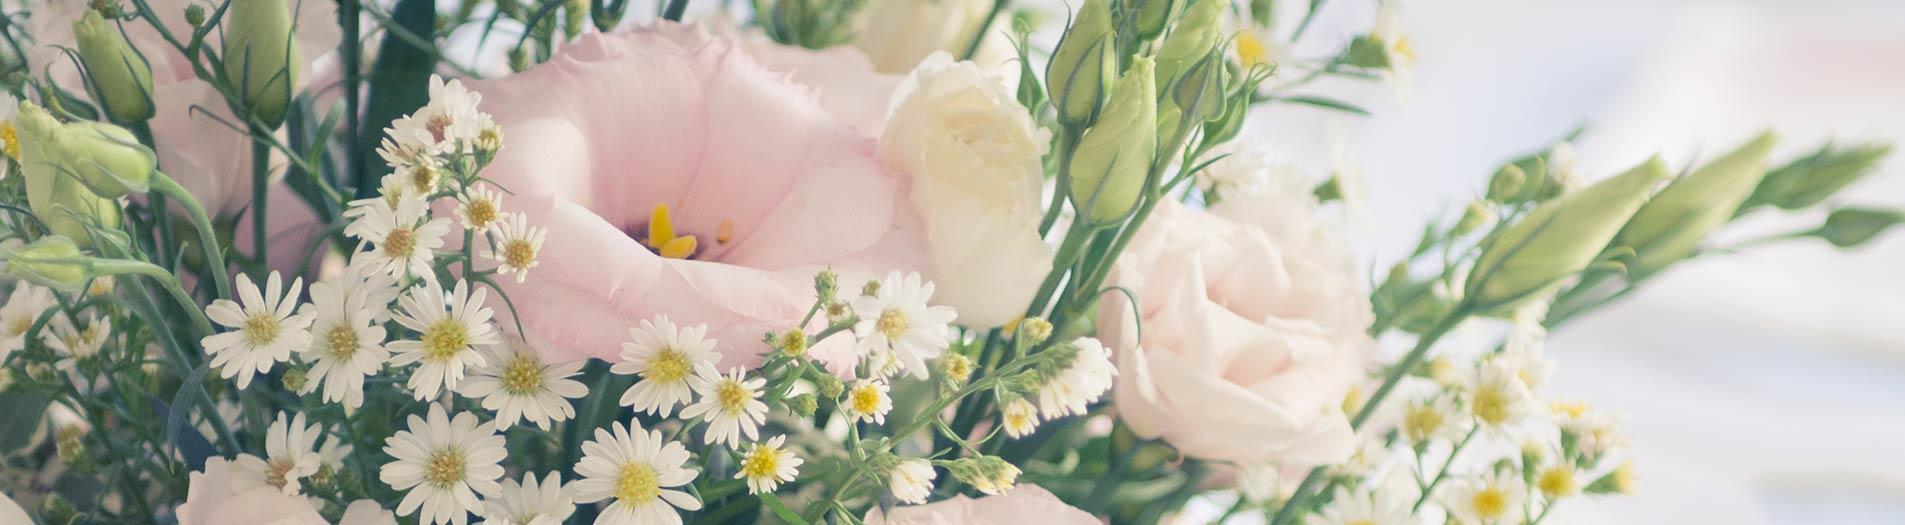 Matrimonio Country Chic Fiori : Fiori matrimonio country chic